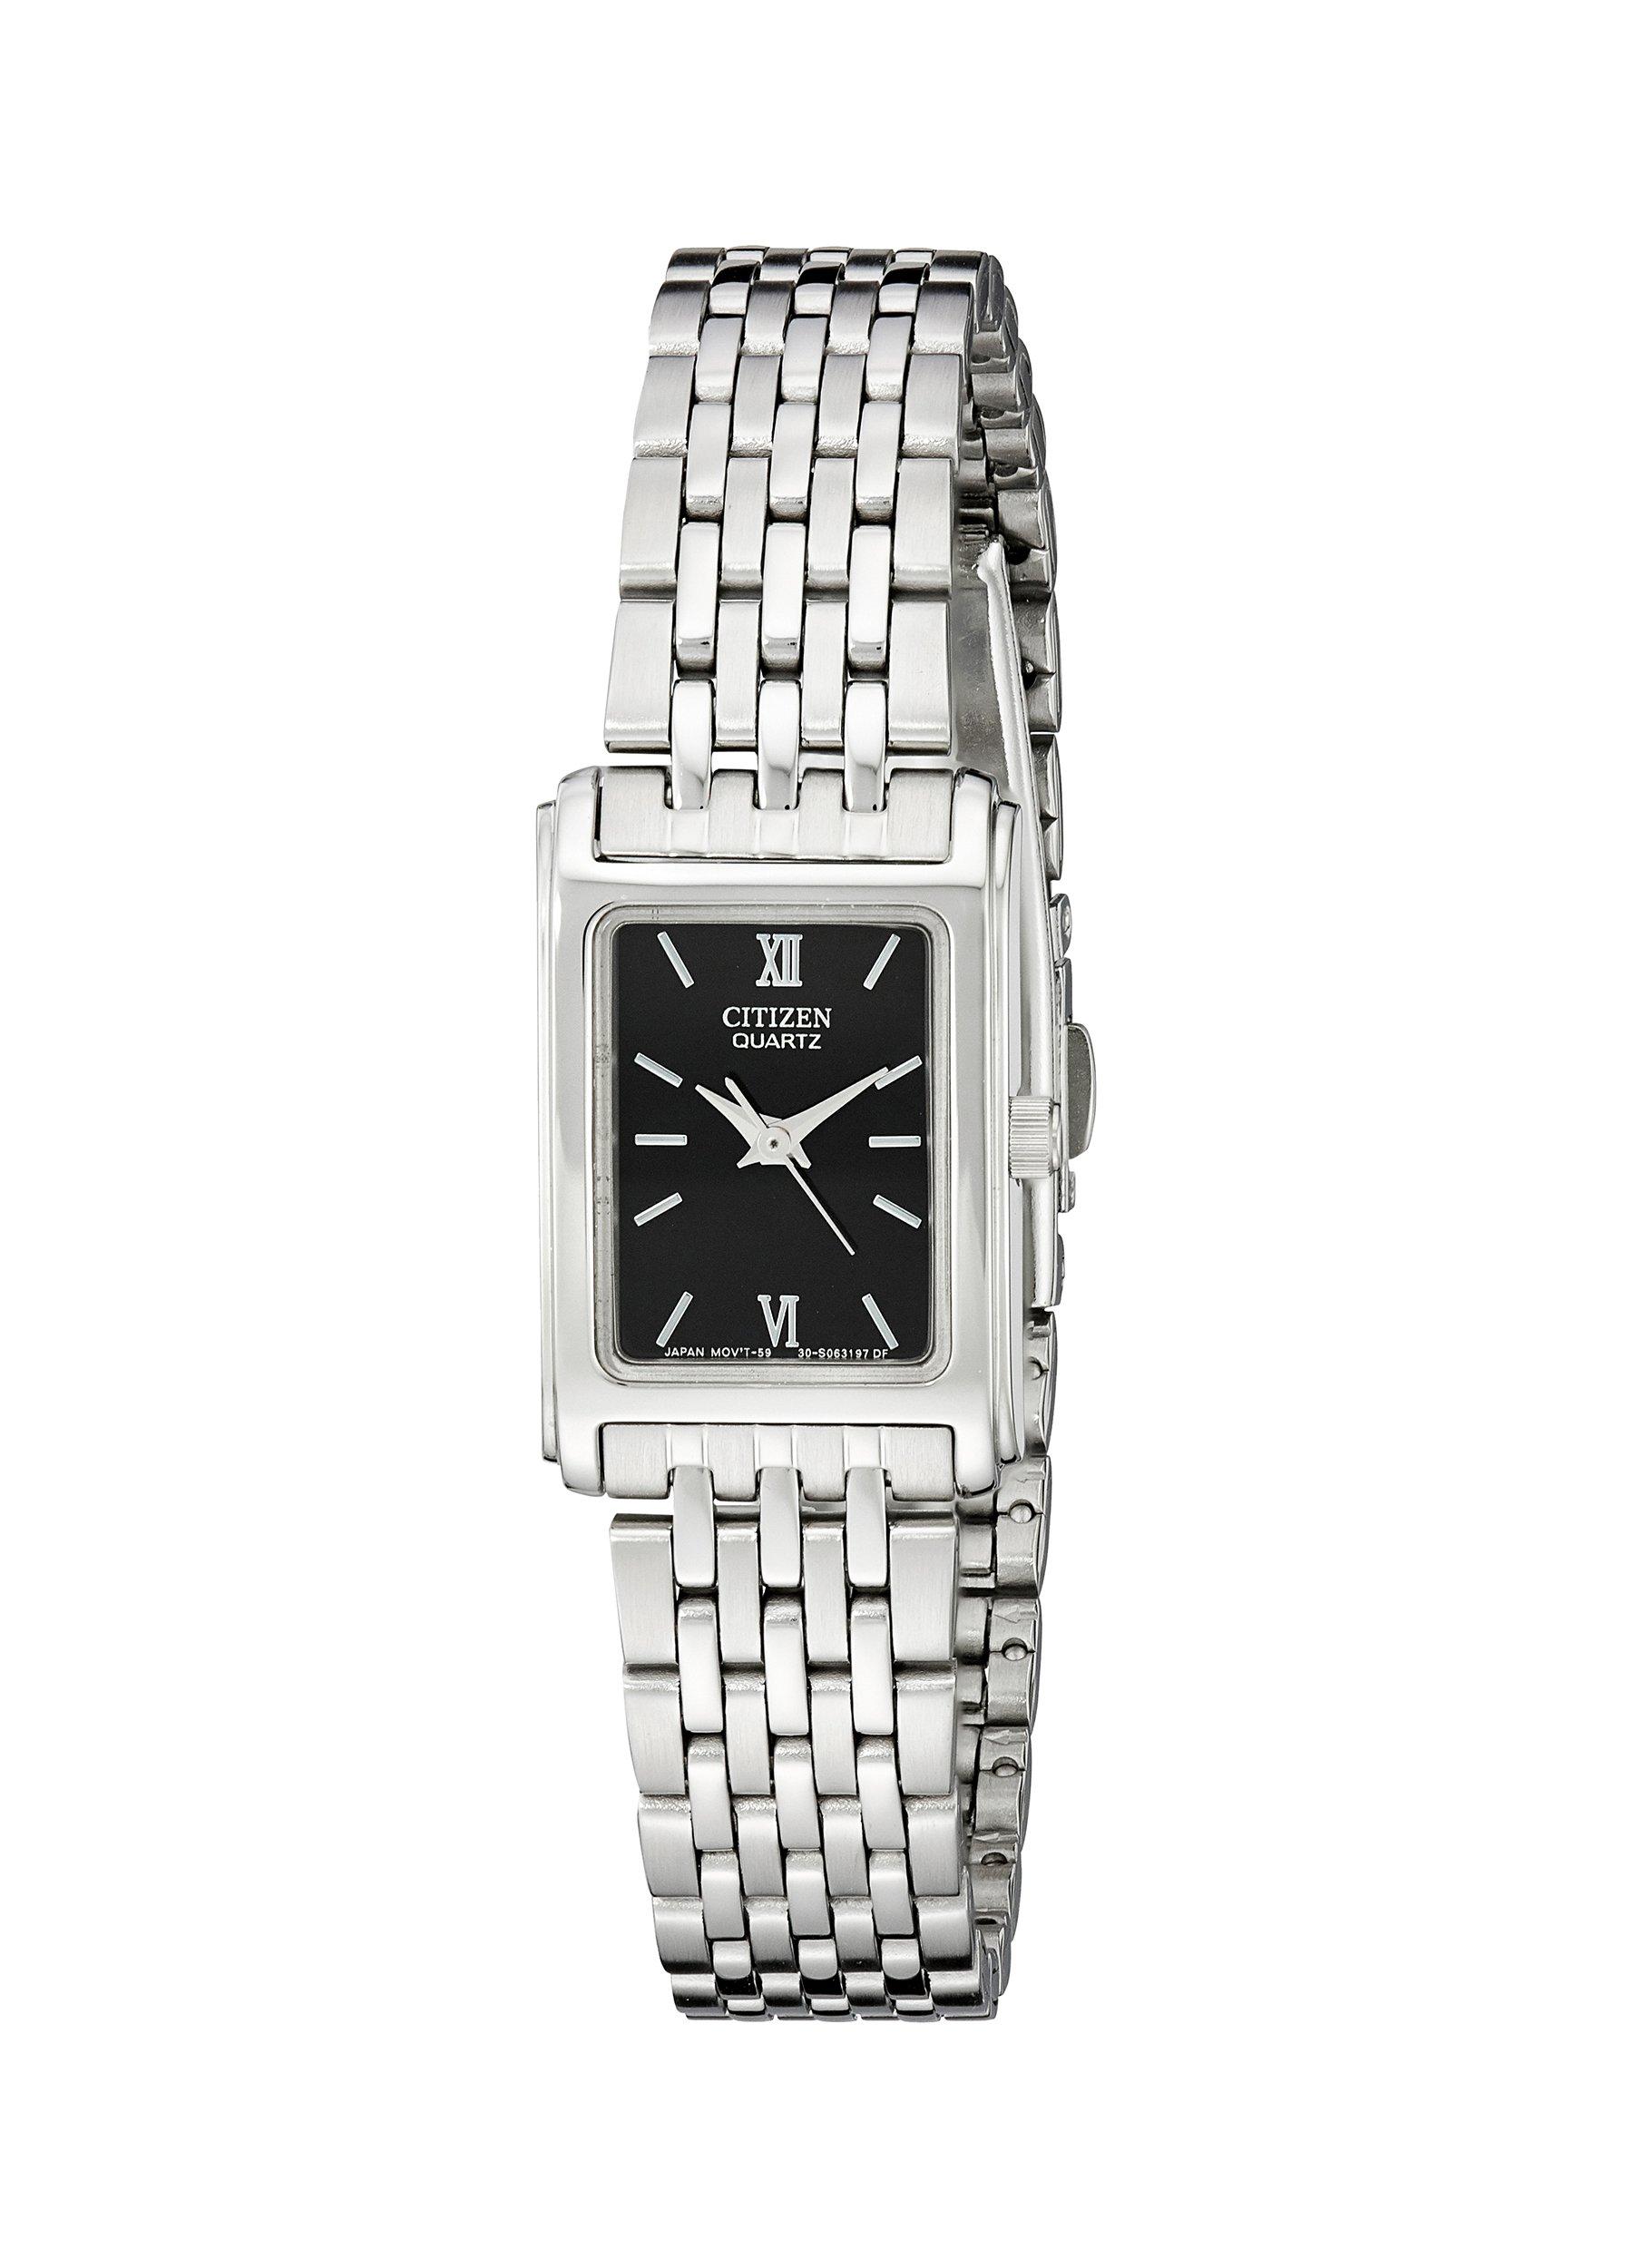 Women's Quartz Stainless Steel Watch, EJ5850-57E